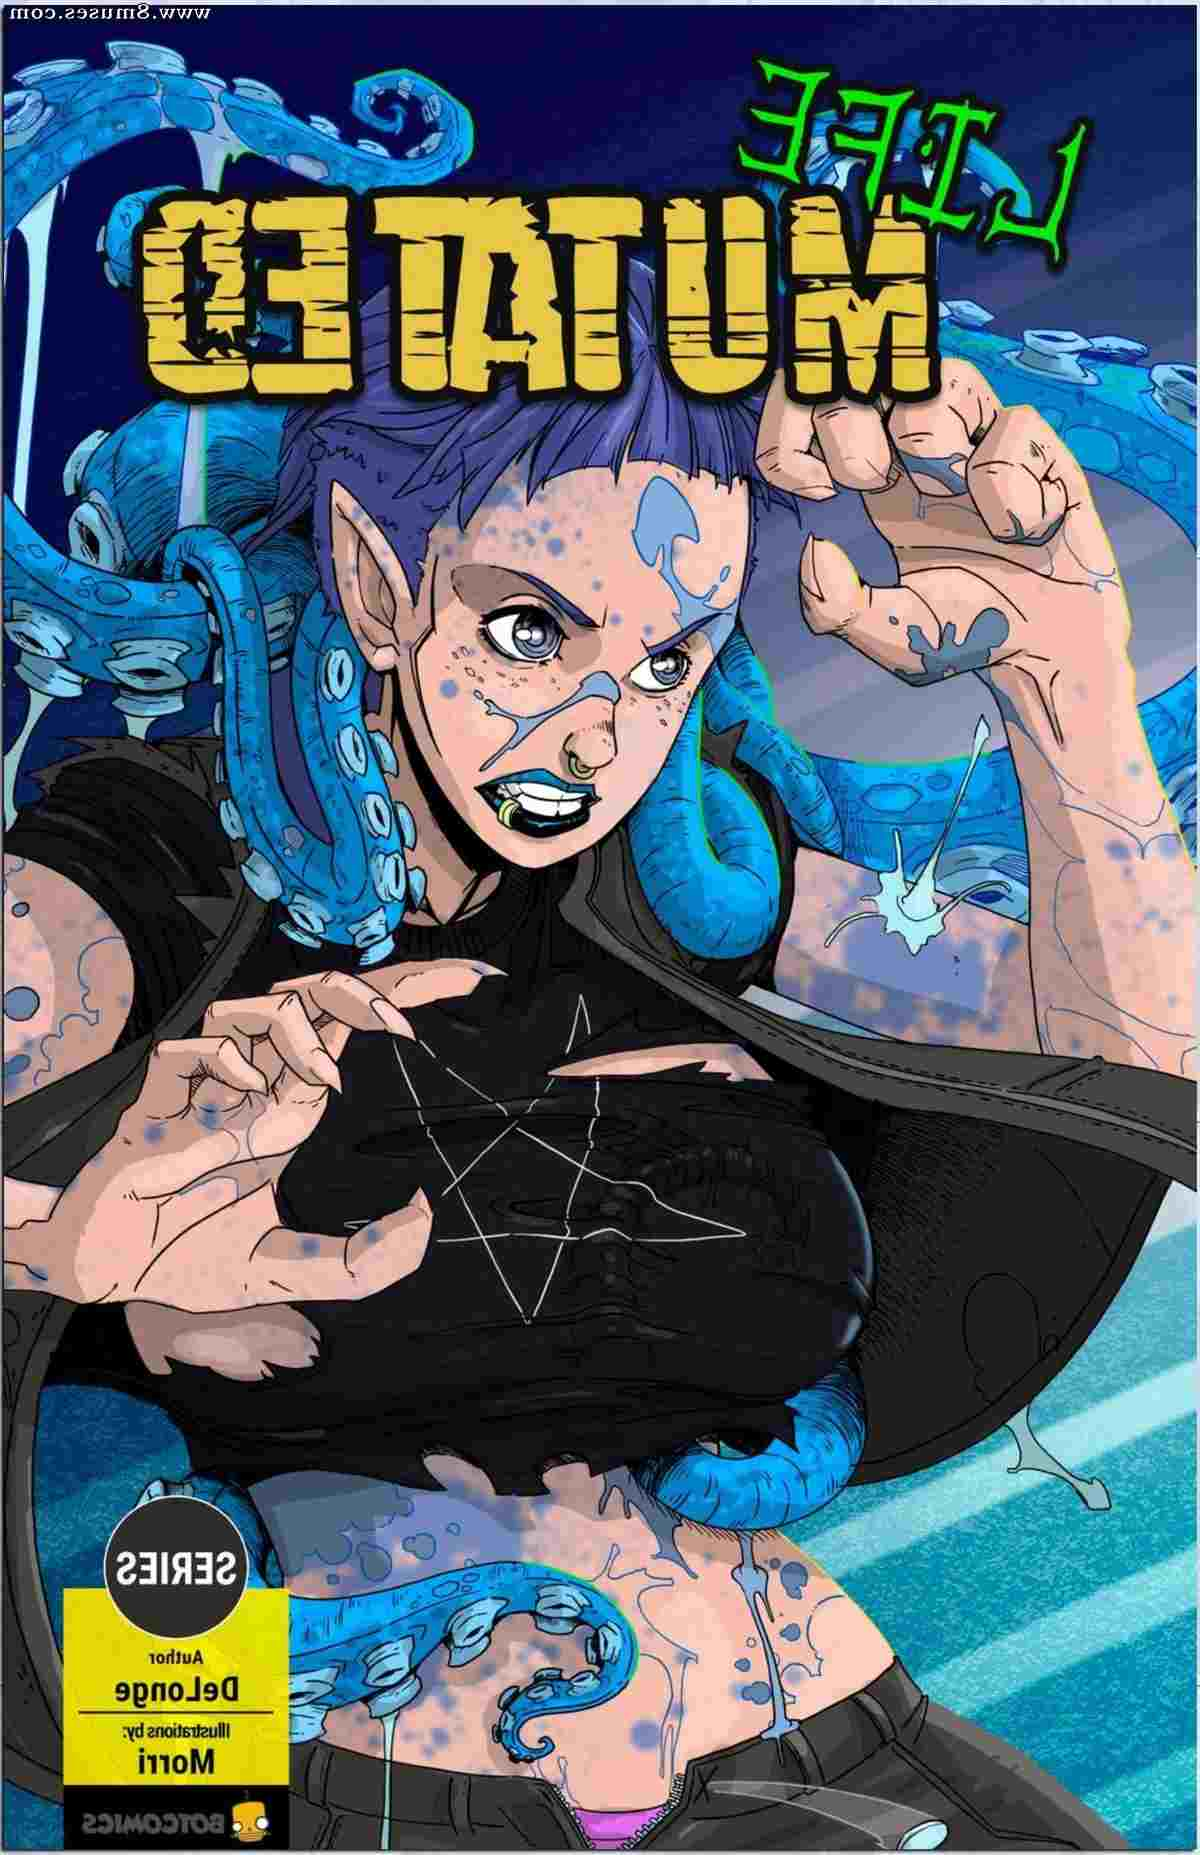 Giantess-Club-Comics/Life-Mutated Life_Mutated__8muses_-_Sex_and_Porn_Comics.jpg